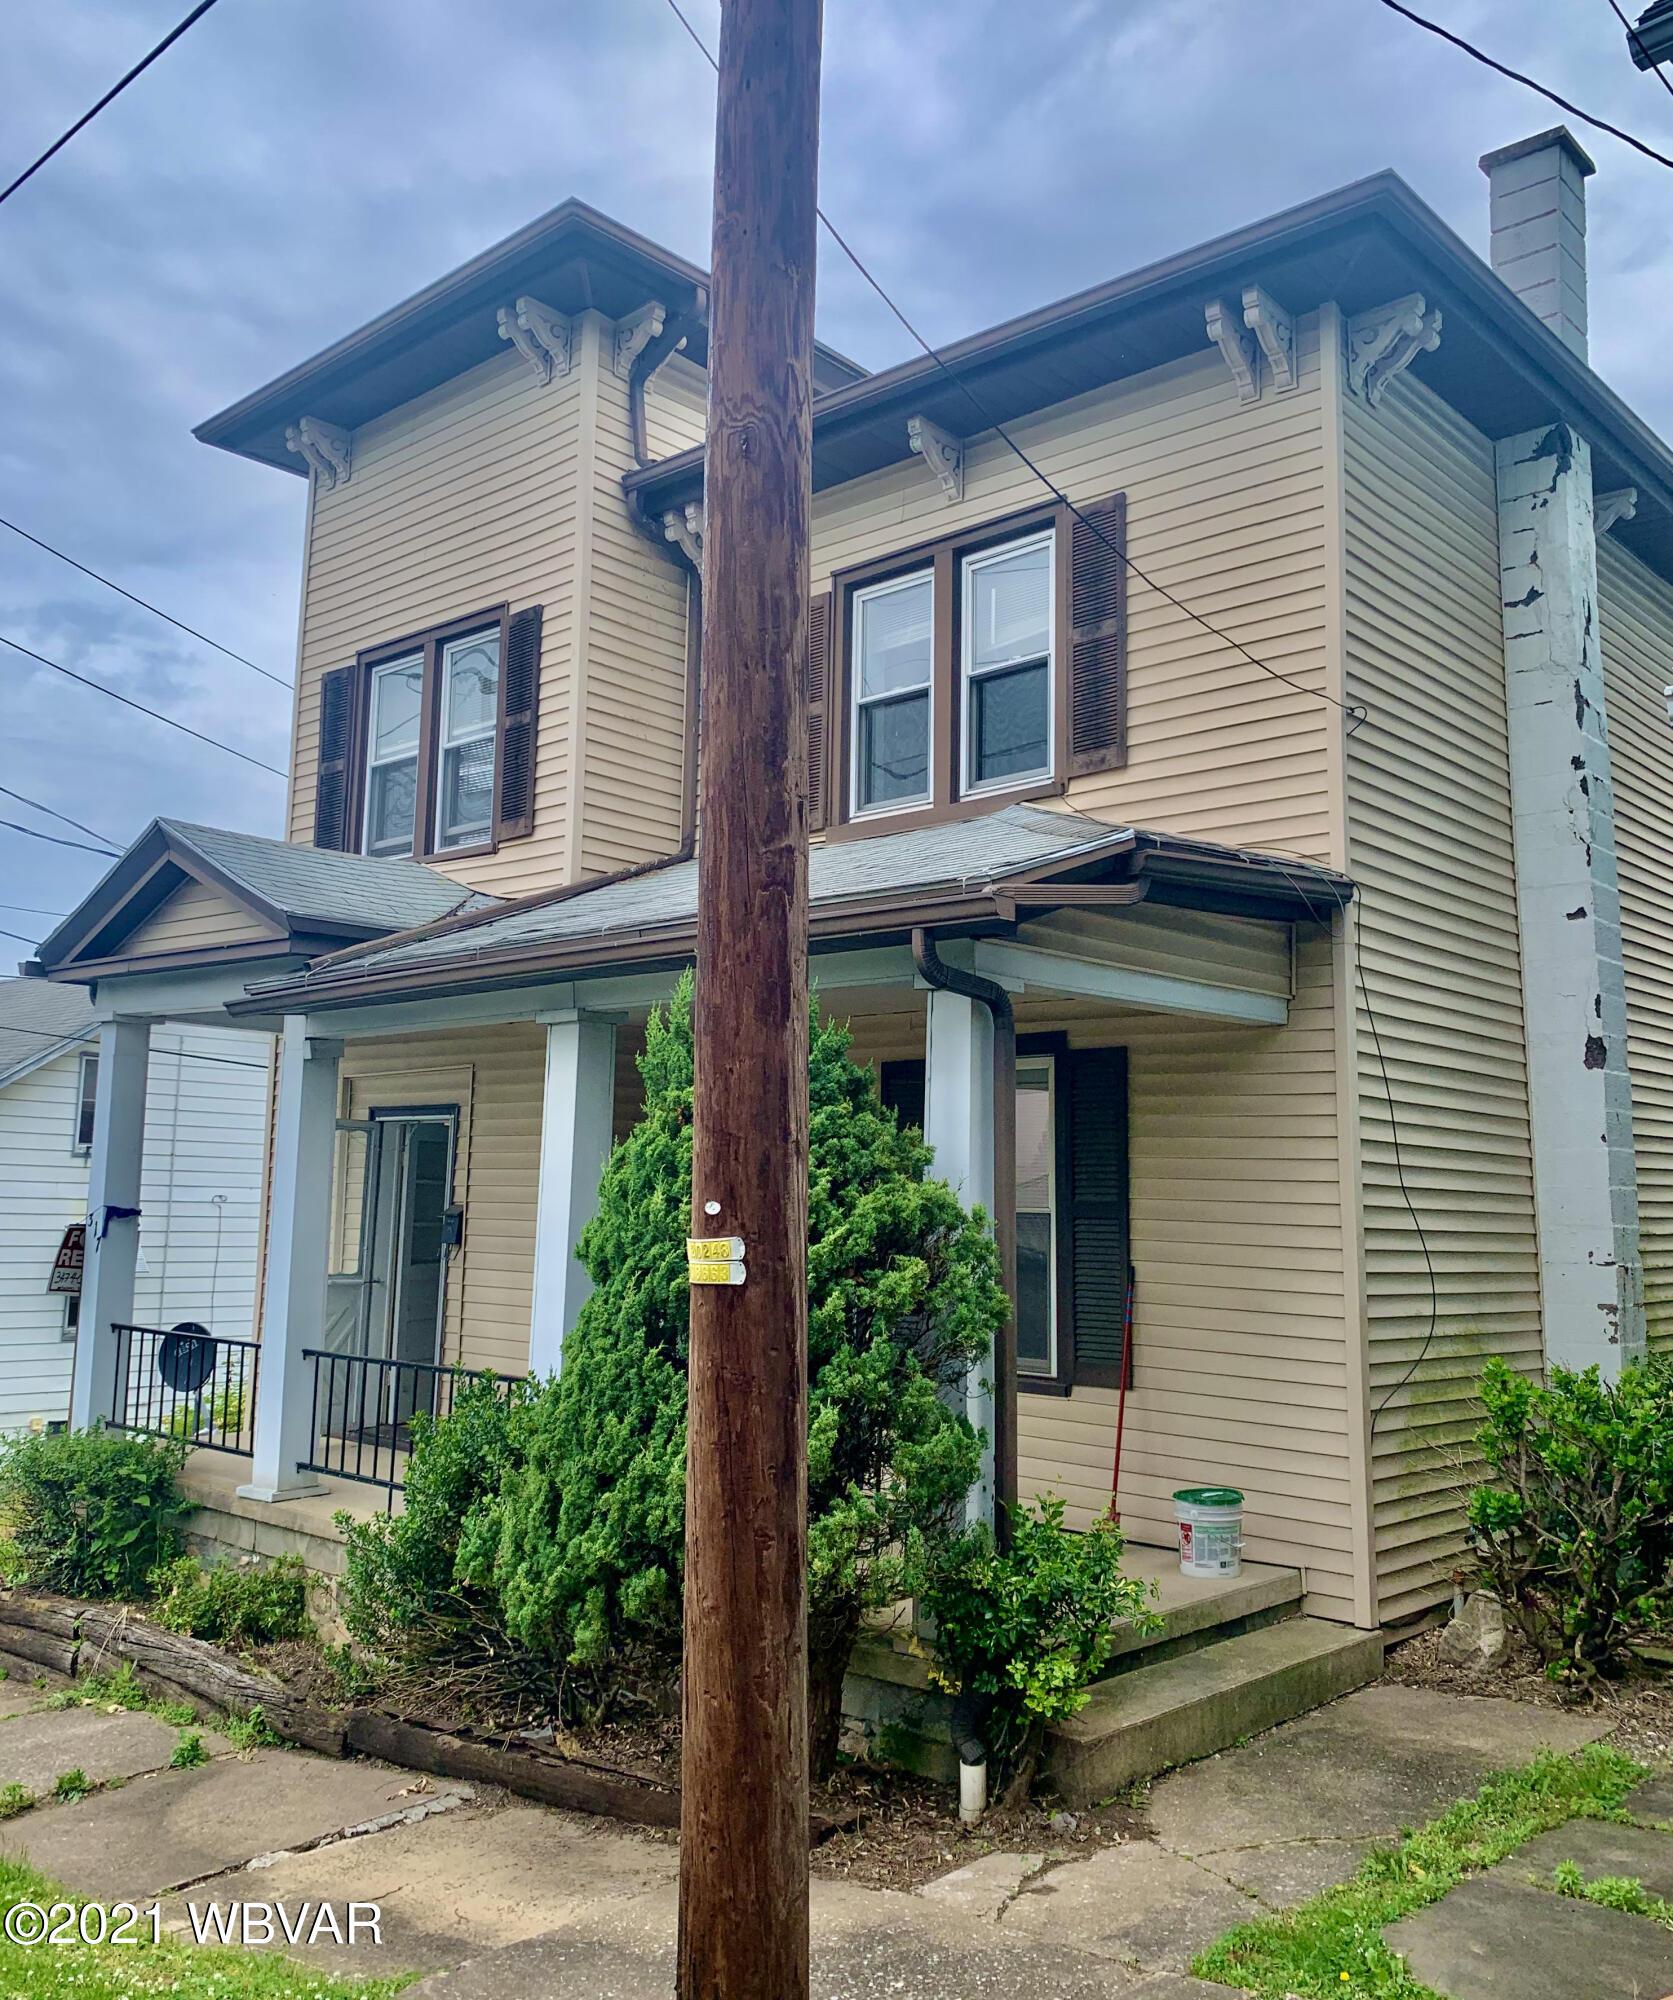 319 MEADOW STREET, S. Williamsport, PA 17702, 2 Bedrooms Bedrooms, ,1 BathroomBathrooms,Resid-lease/rental,For sale,MEADOW,WB-92749